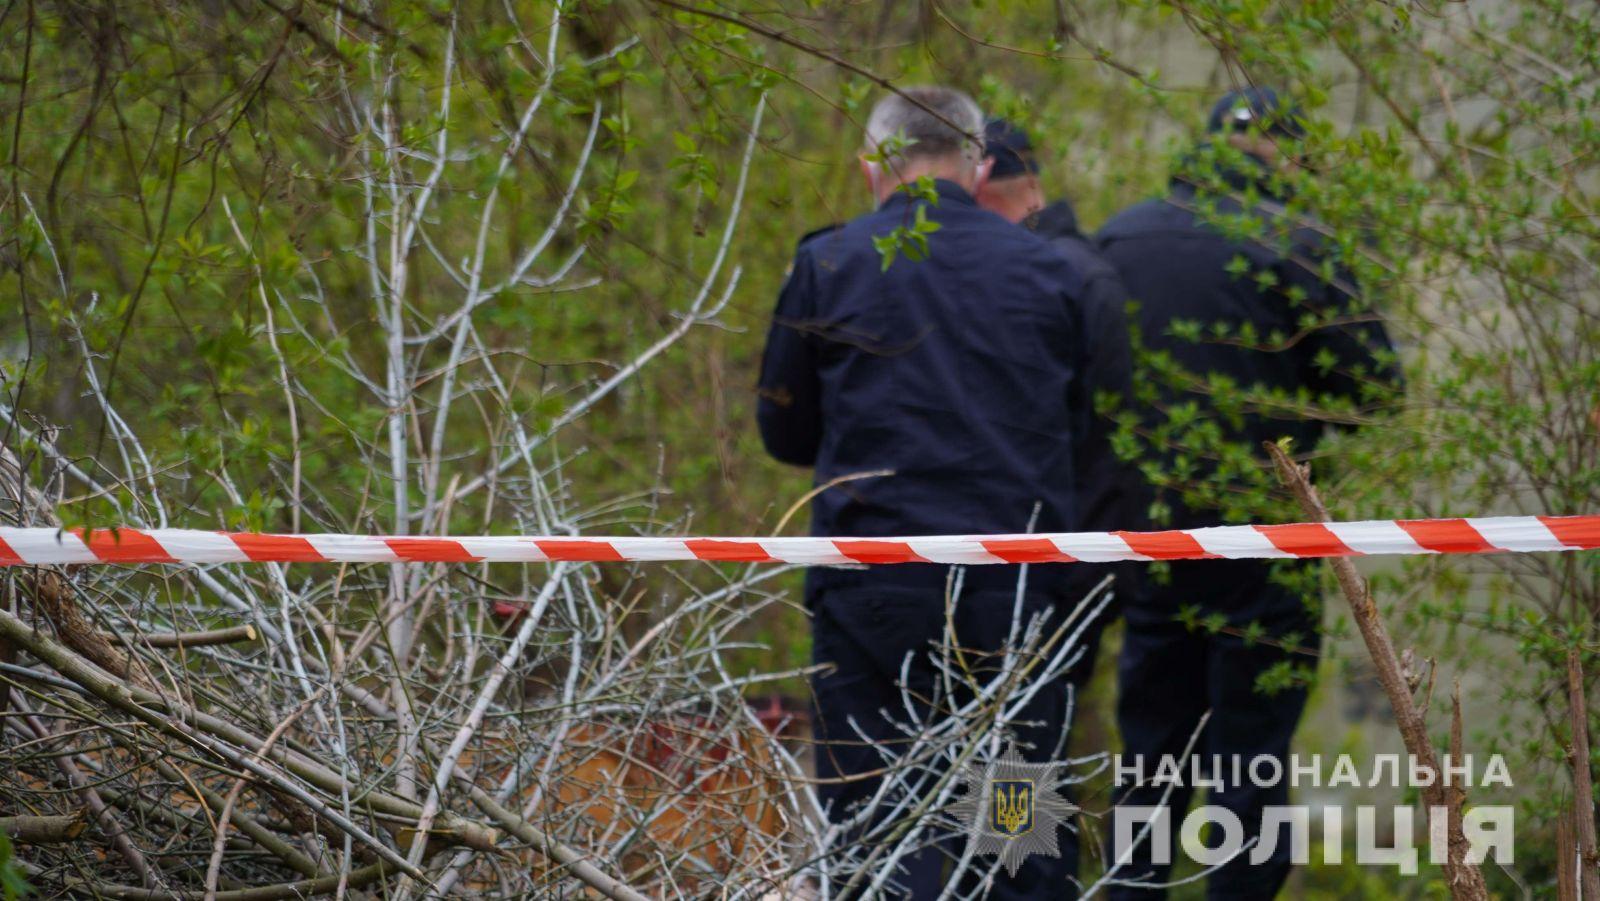 Во Львове на территории больницы взорвалась граната: погиб мужчина